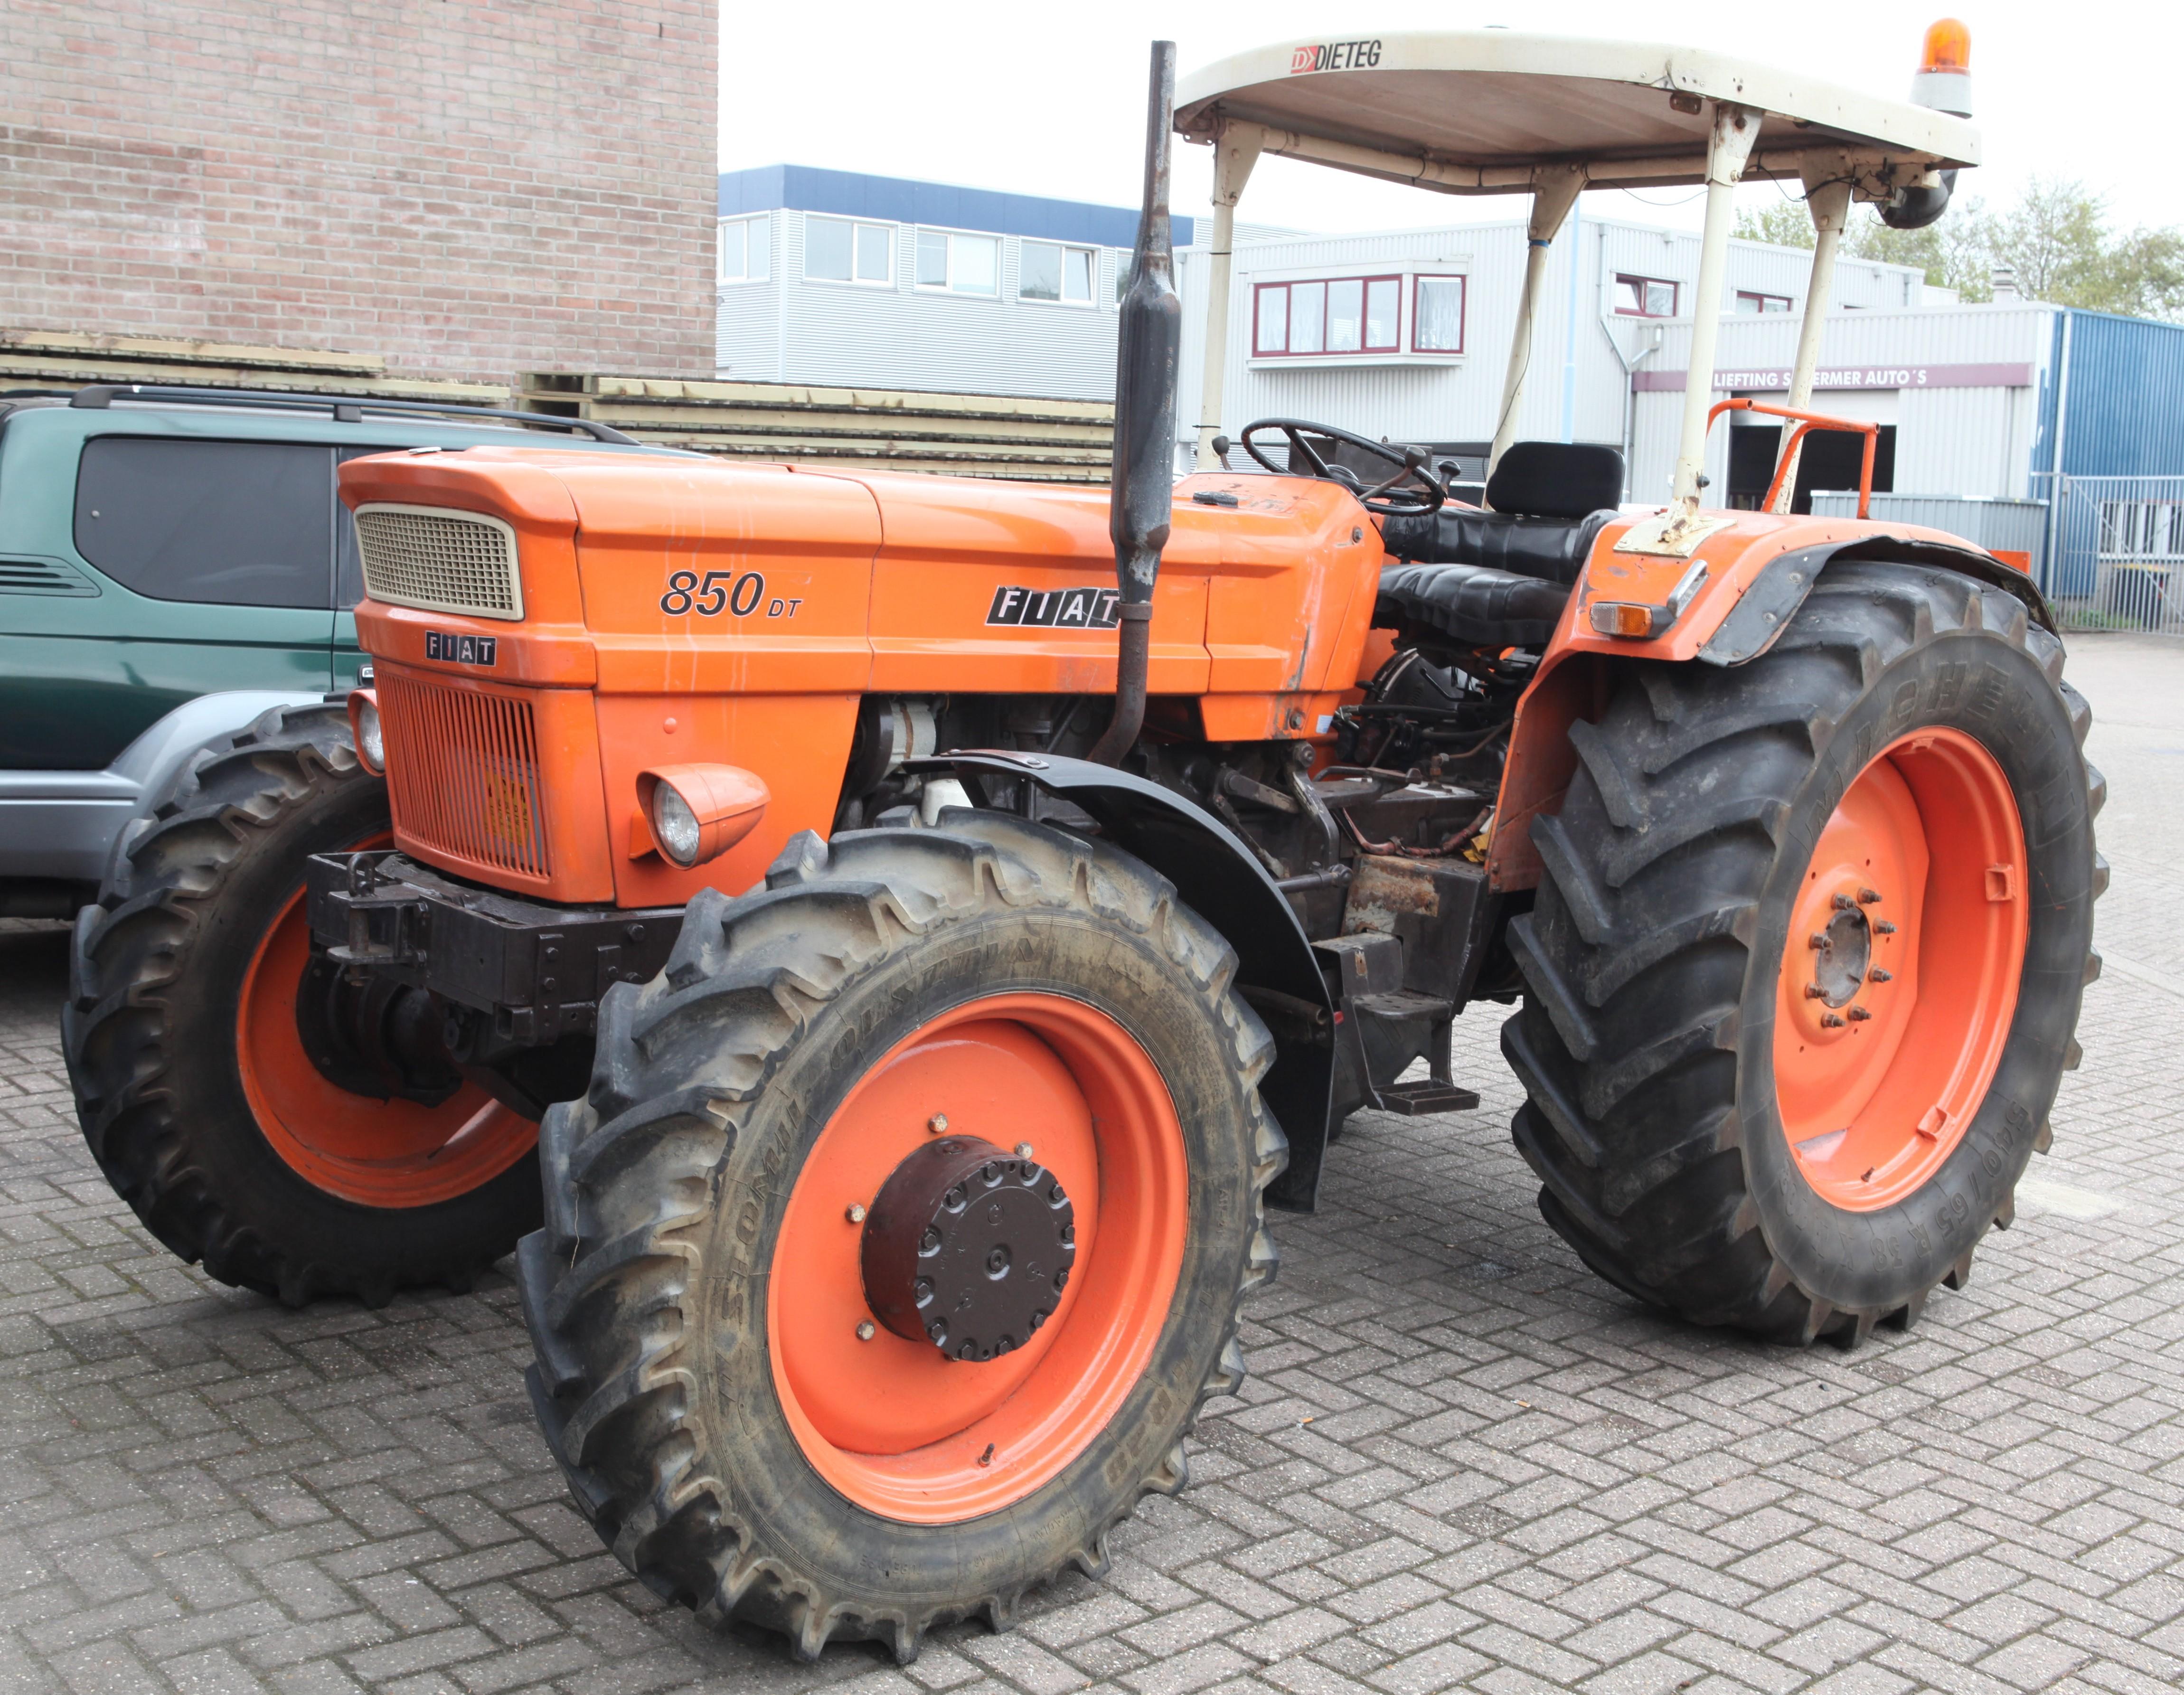 ghazi al new holland fiat construction latest model tractor wiki cb plant history